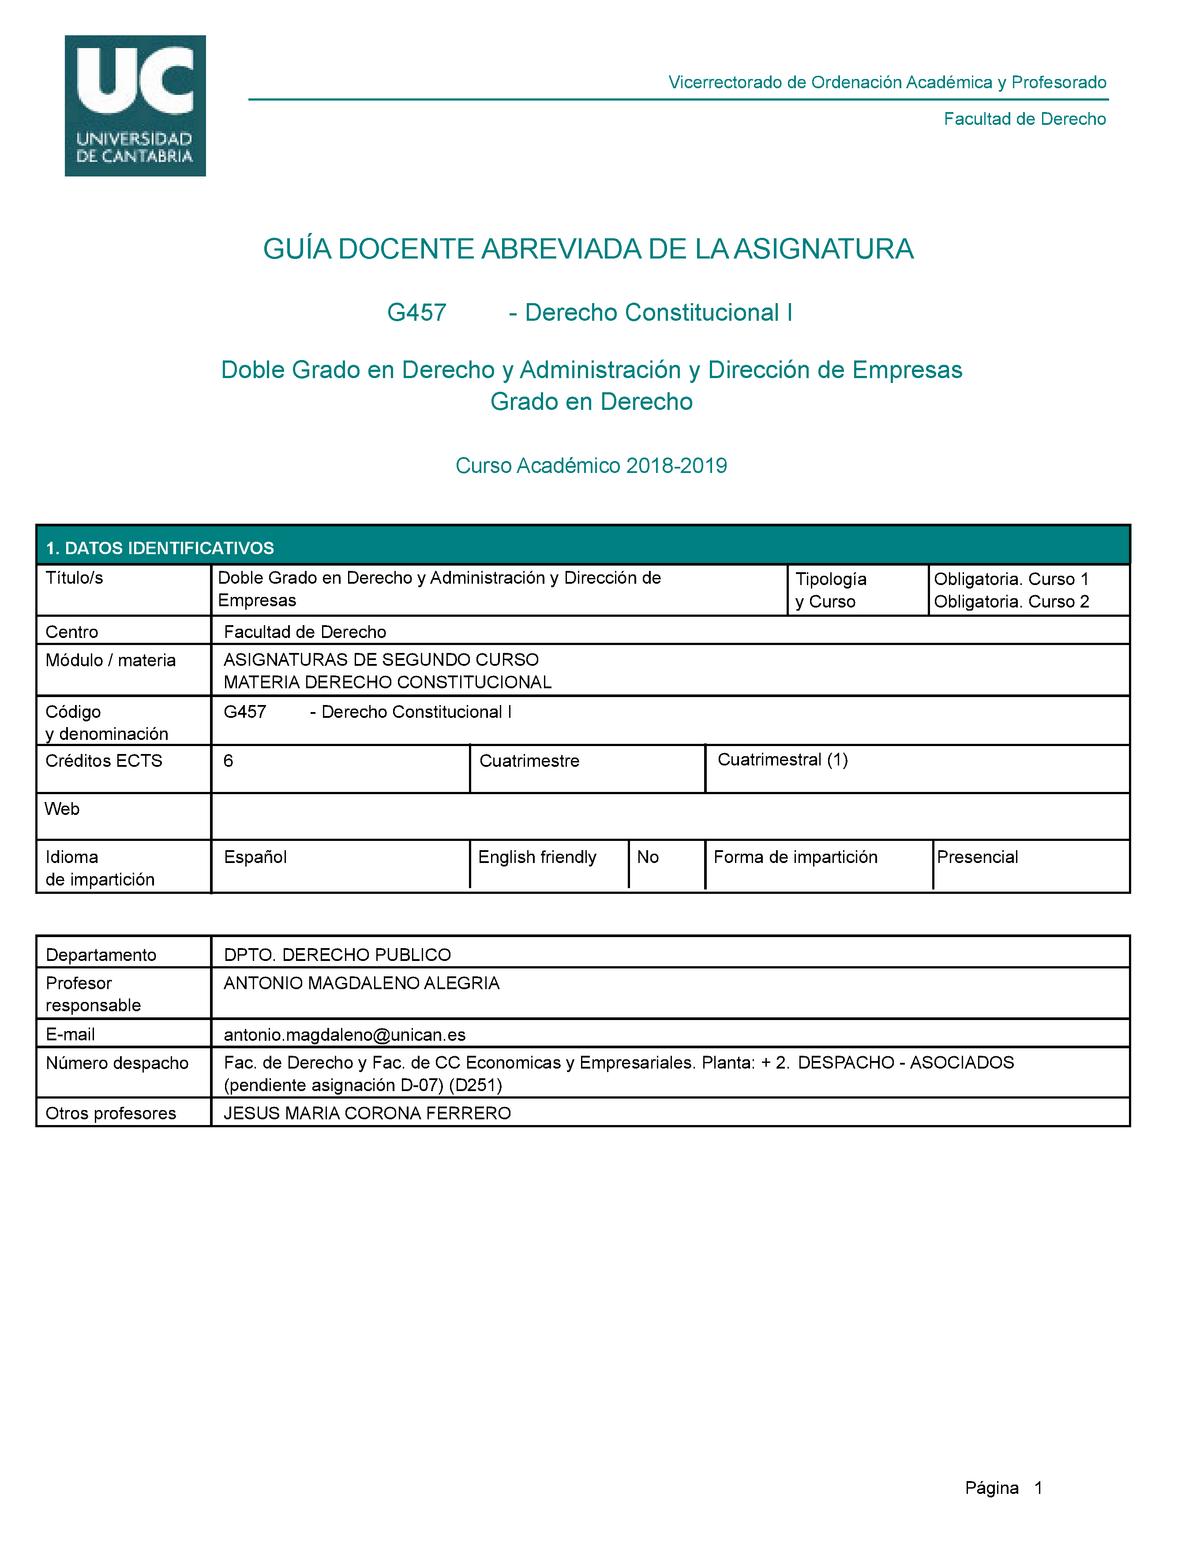 Calendario Examenes Unican Derecho.Resumen G457 G457 26 Jan 2019 Studocu